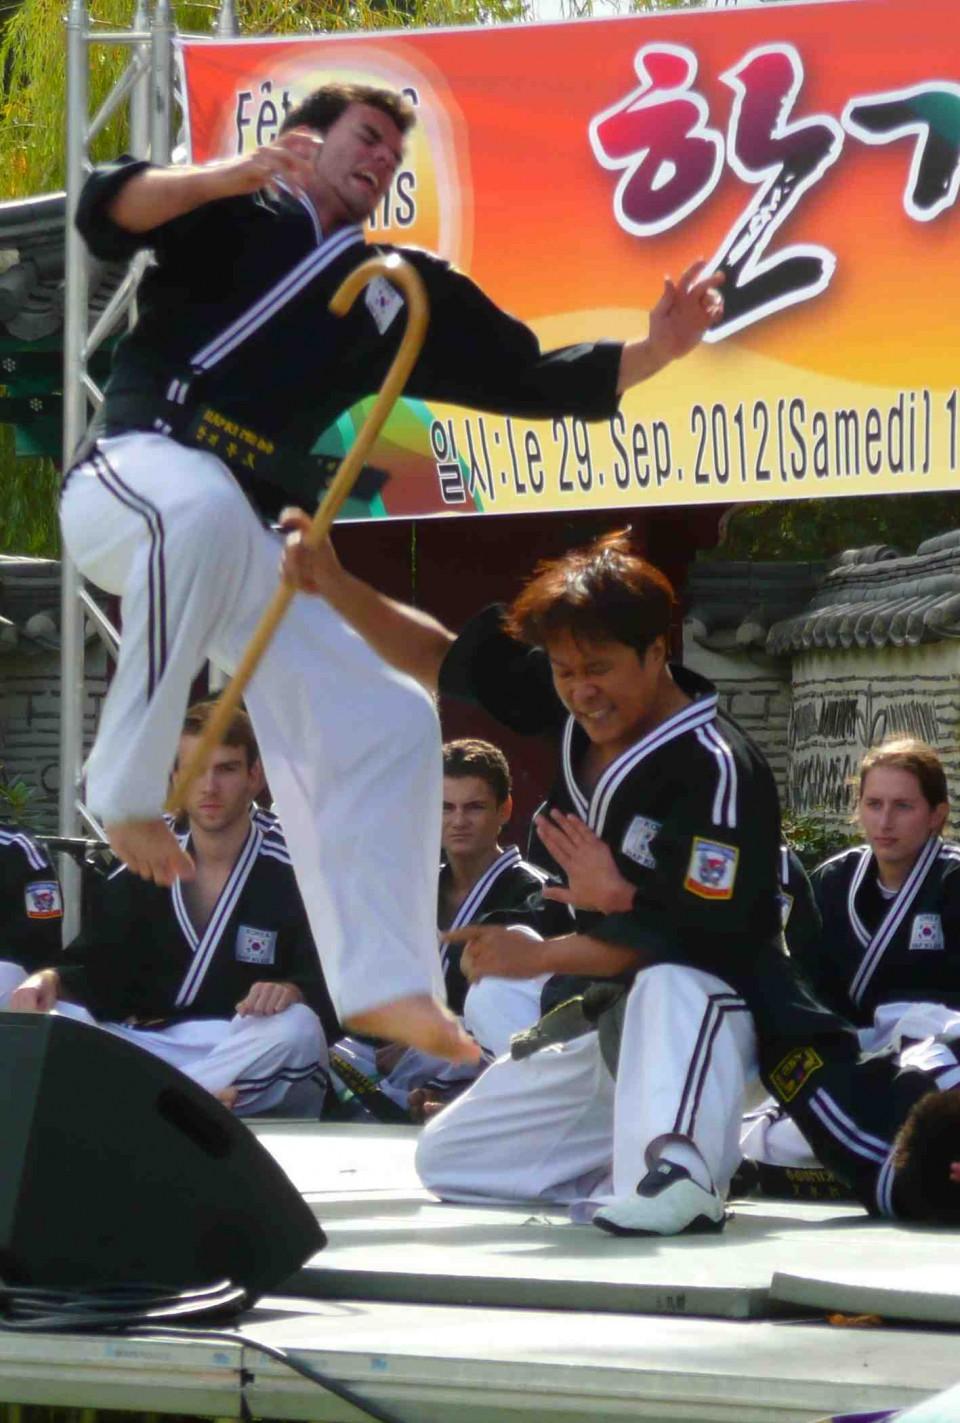 Chuseok 2012